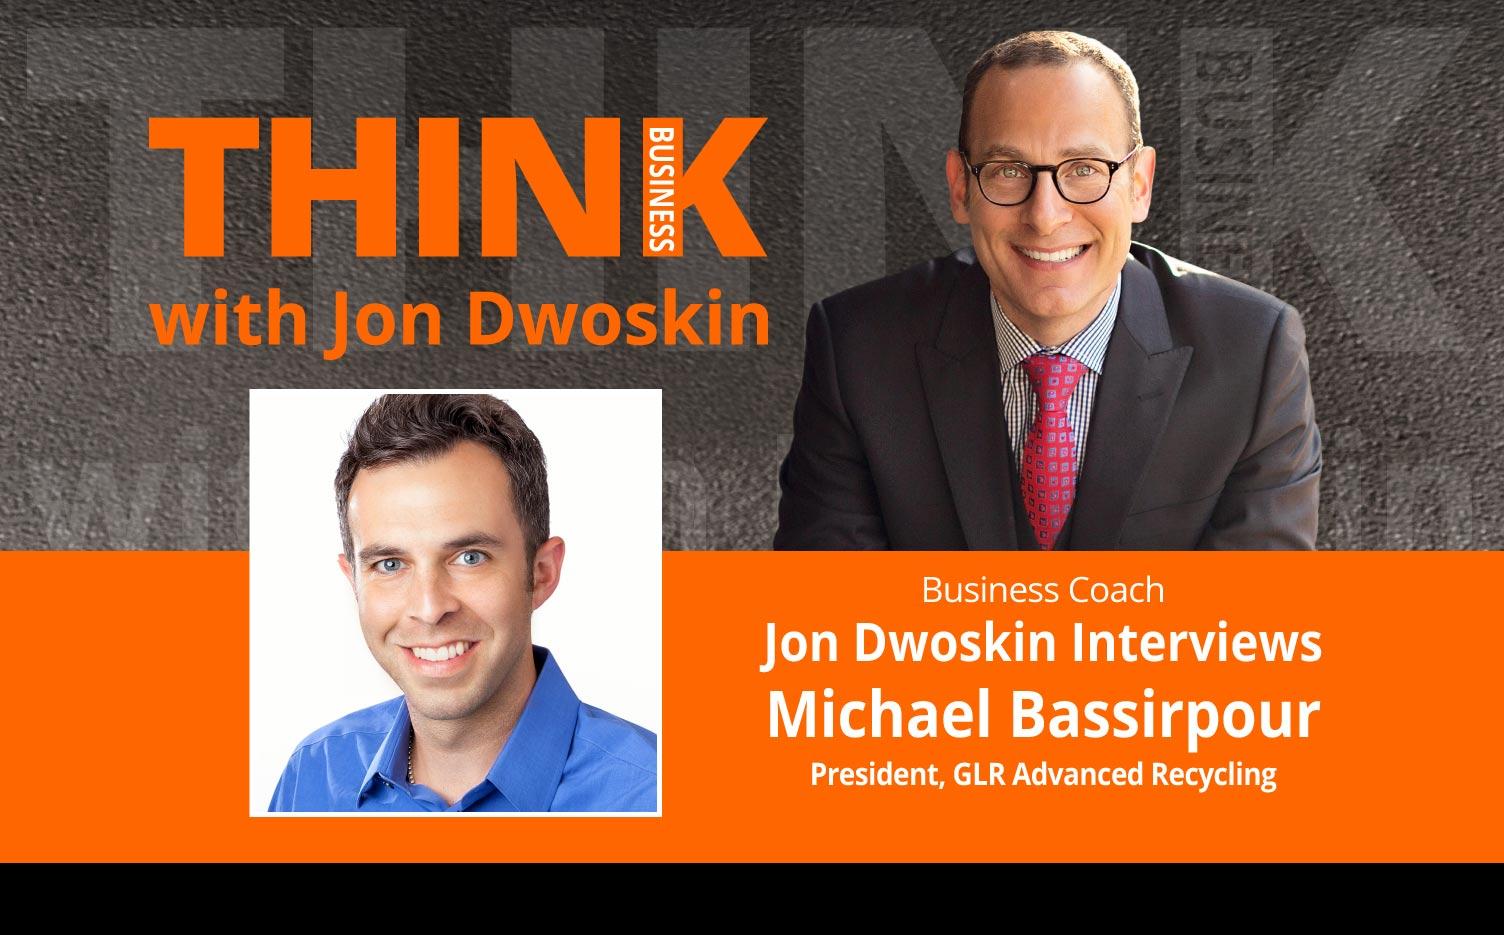 THINK Business: Jon Dwoskin Interviews Michael Bassirpour, President, GLR Advanced Recycling